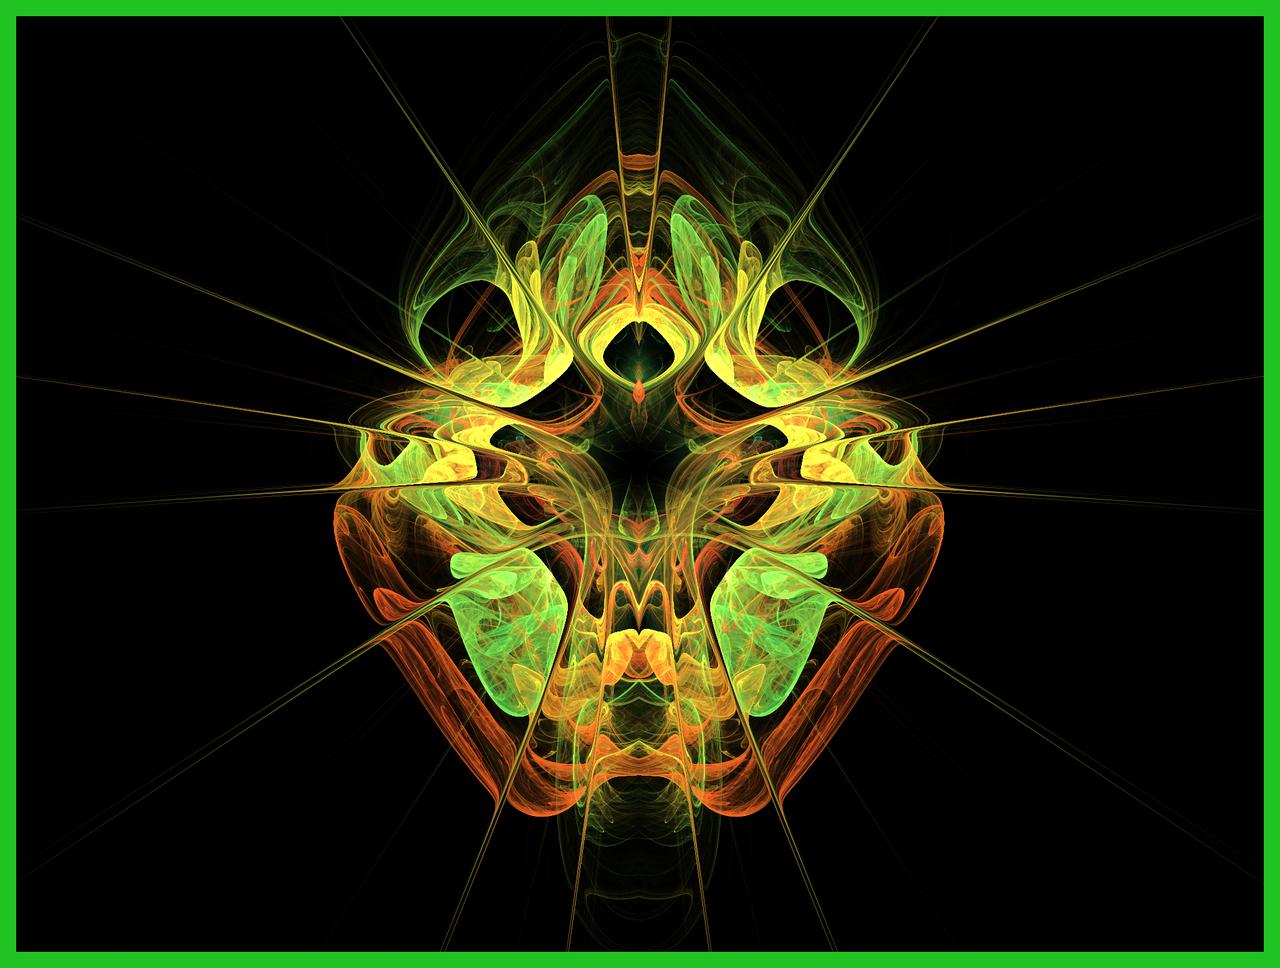 Your Alien Heart by Leichenengel